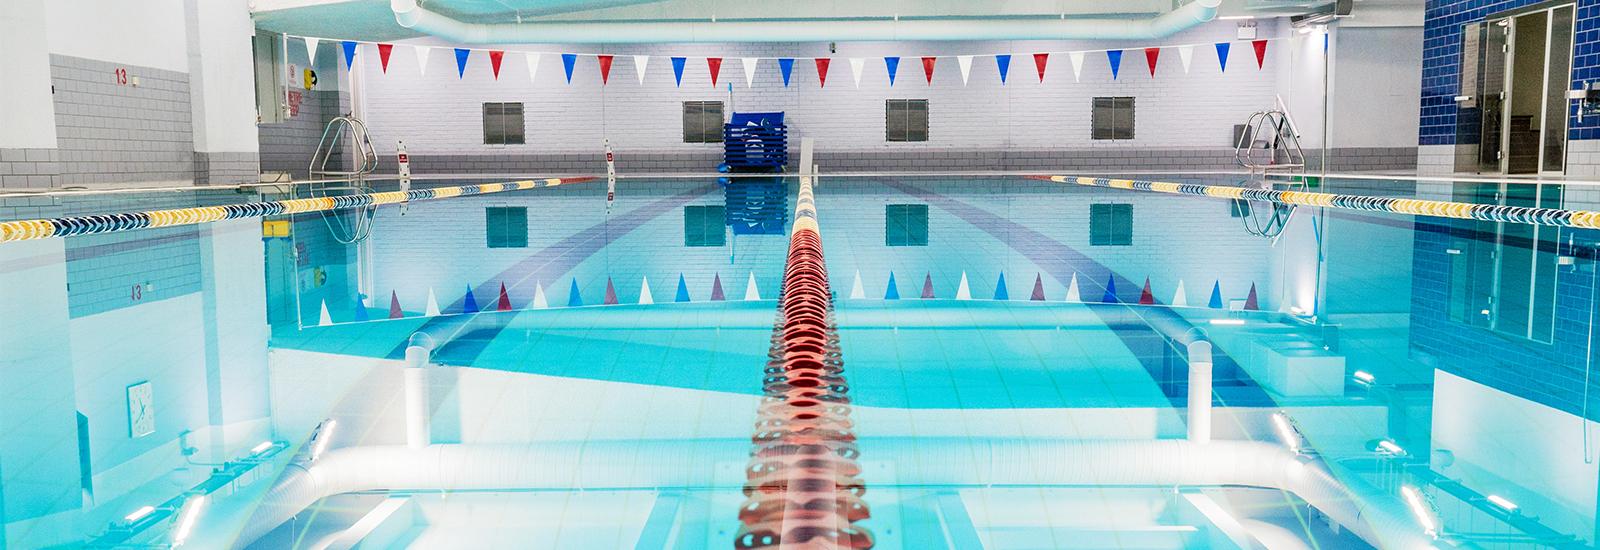 Swimming Pool Lanes YMCA Club London